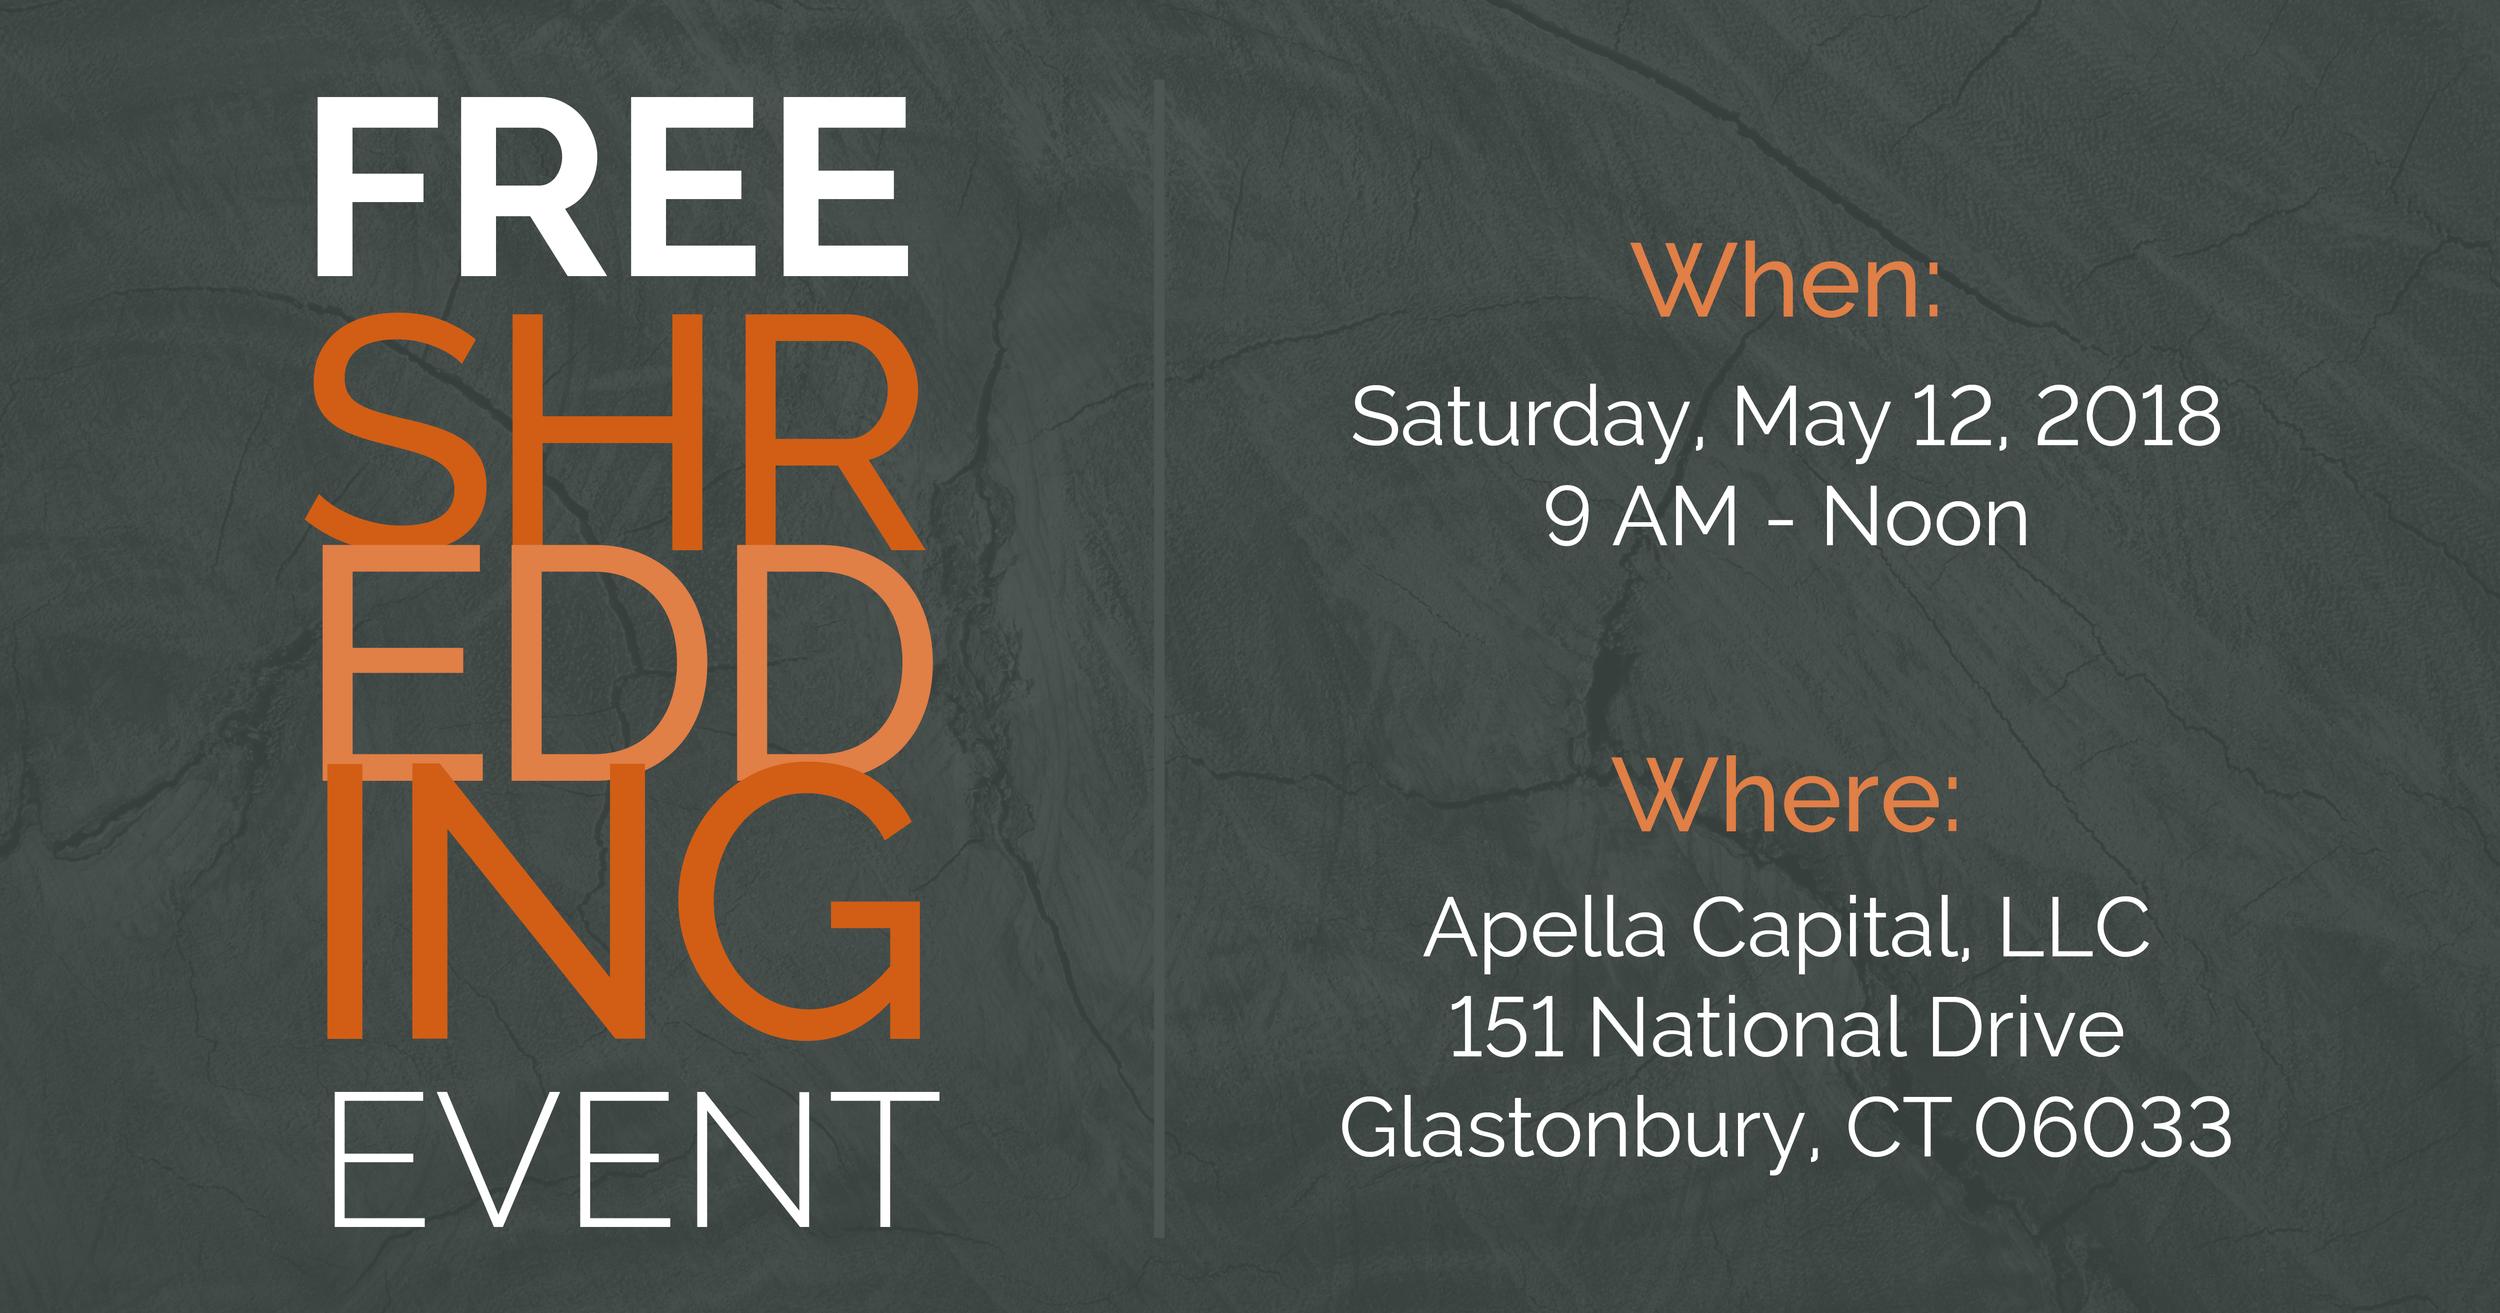 Apella-Shredding-Event-SM-Image.png